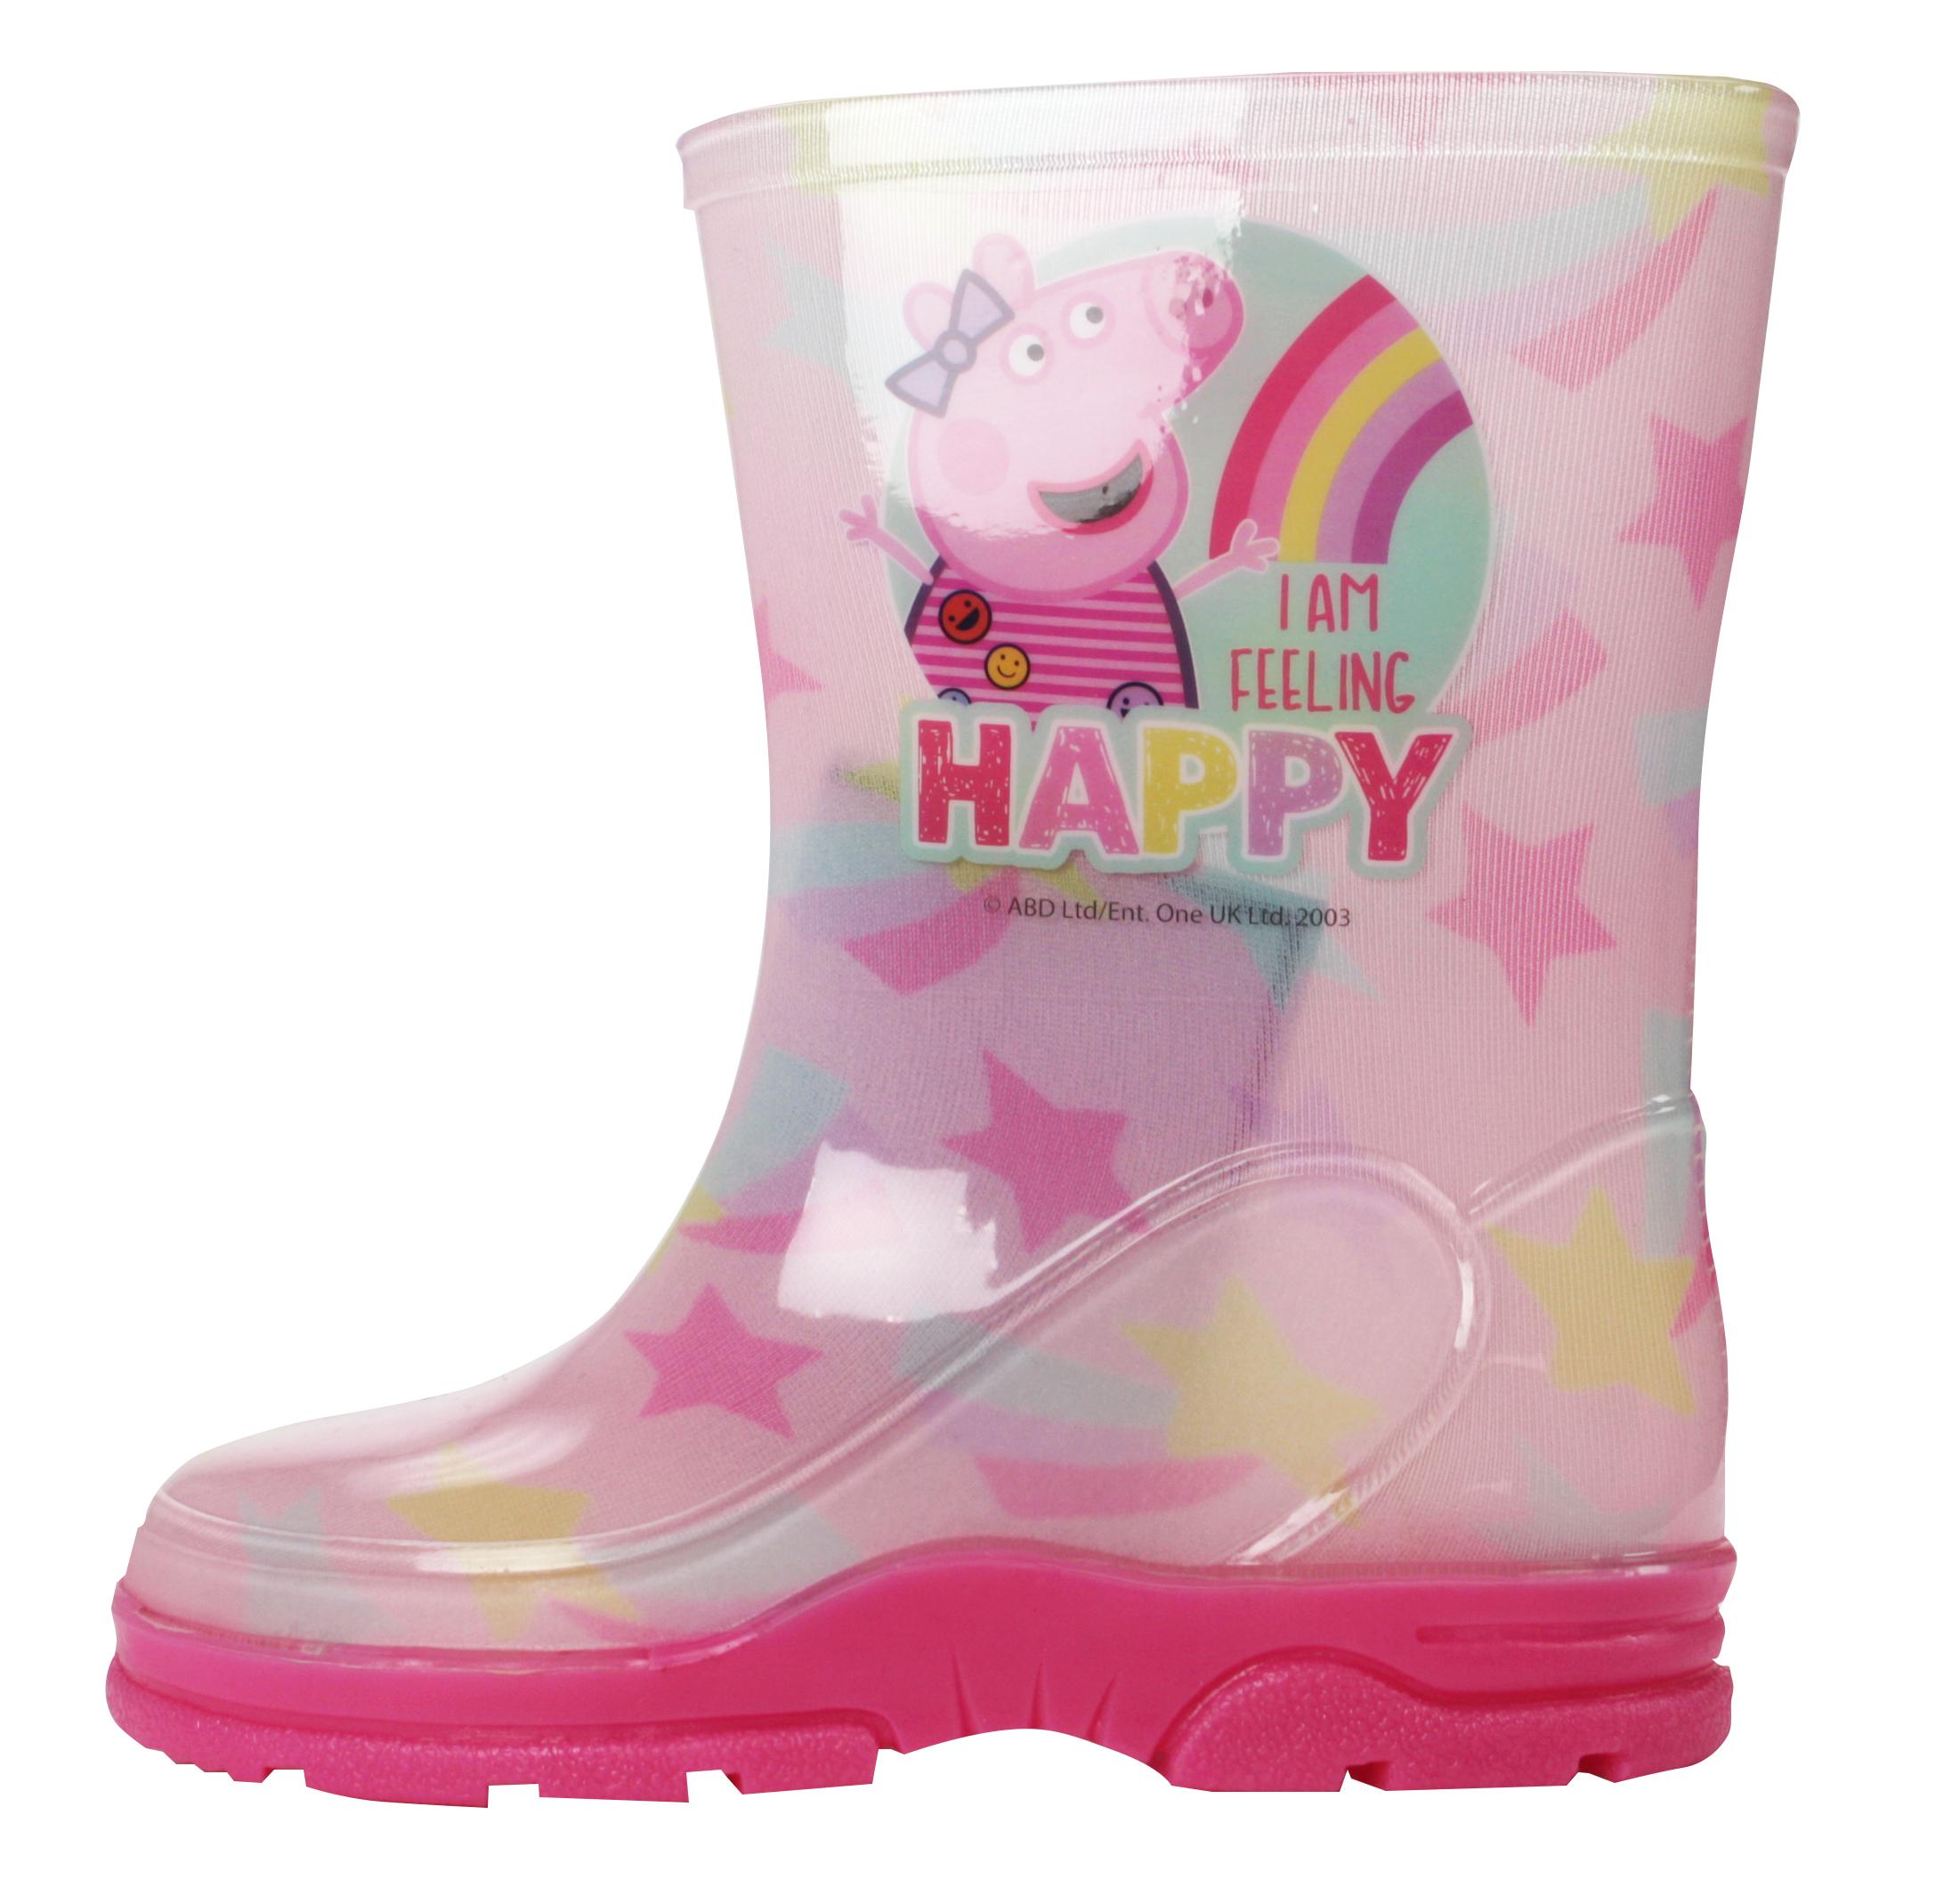 Peppa Pig Girls Glitter Pink Slip On Welly Wellington Boots UK Sizes Child 5-10